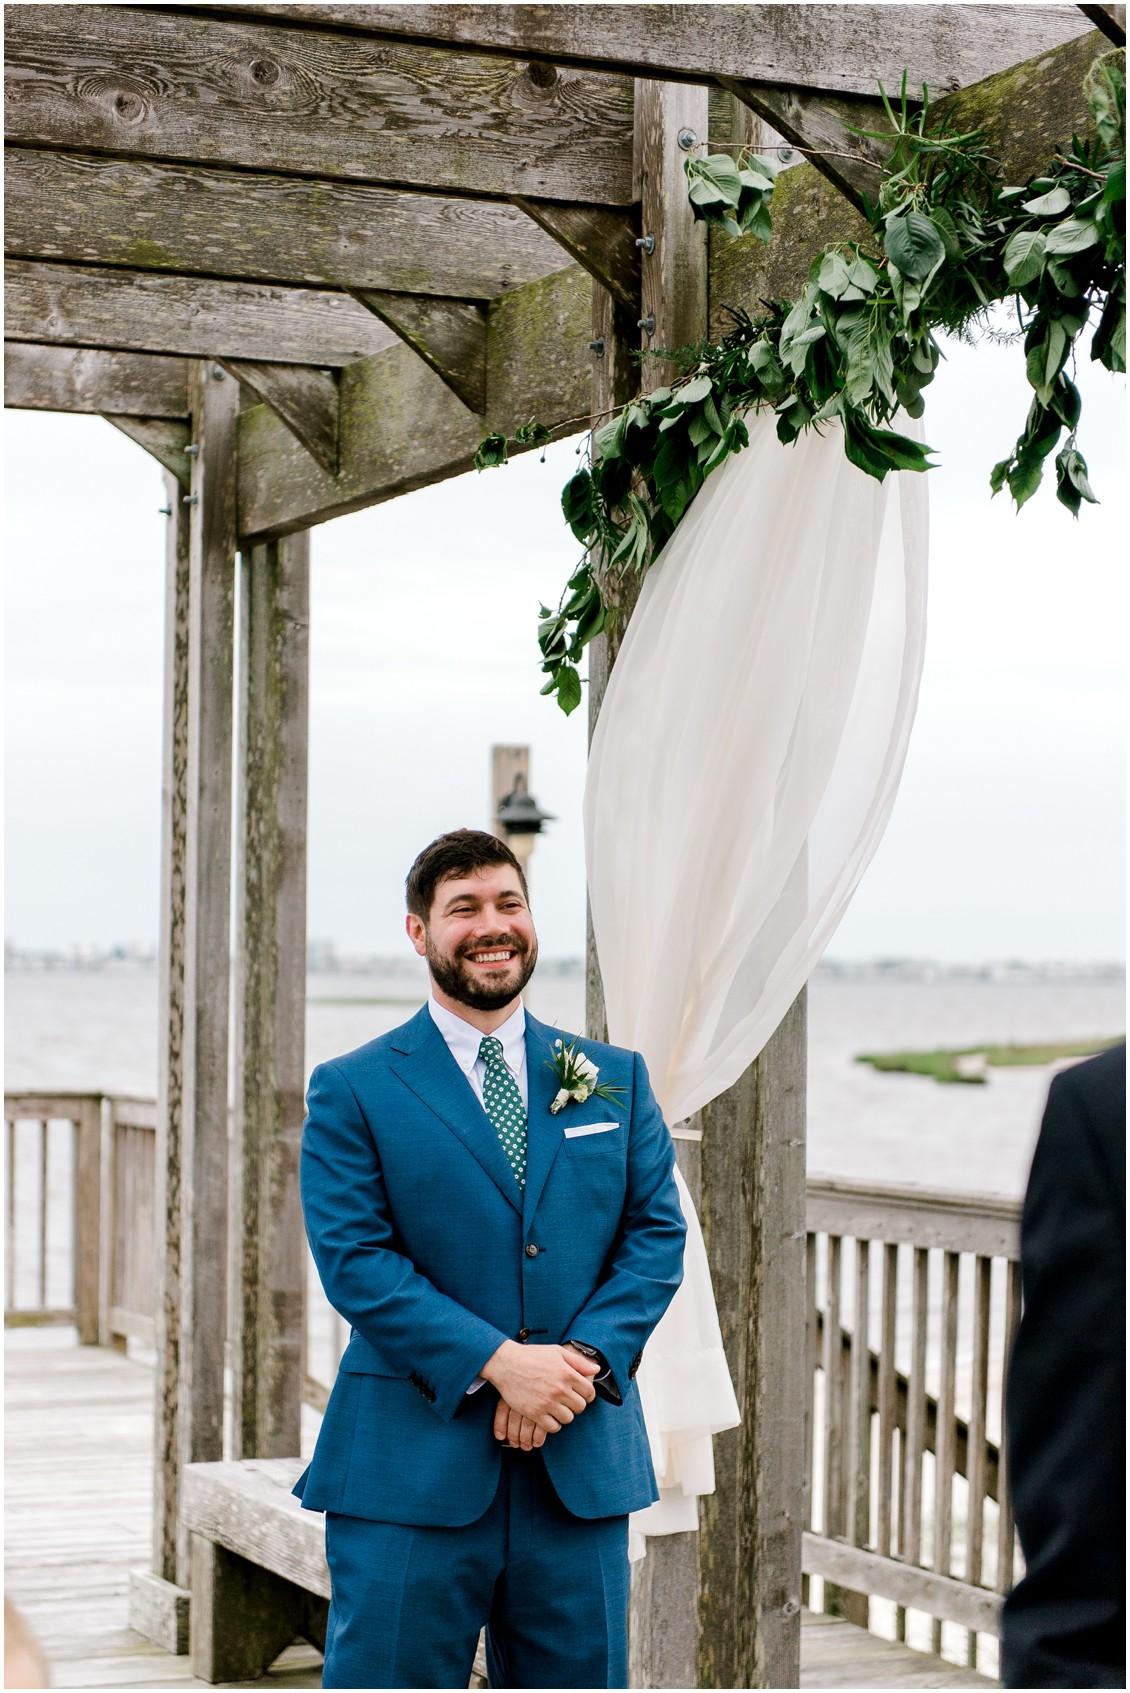 Groom first look naturally beautiful wedding | My Eastern Shore Wedding | Erin Wheeler Photography | Bayside Resort Golf Club